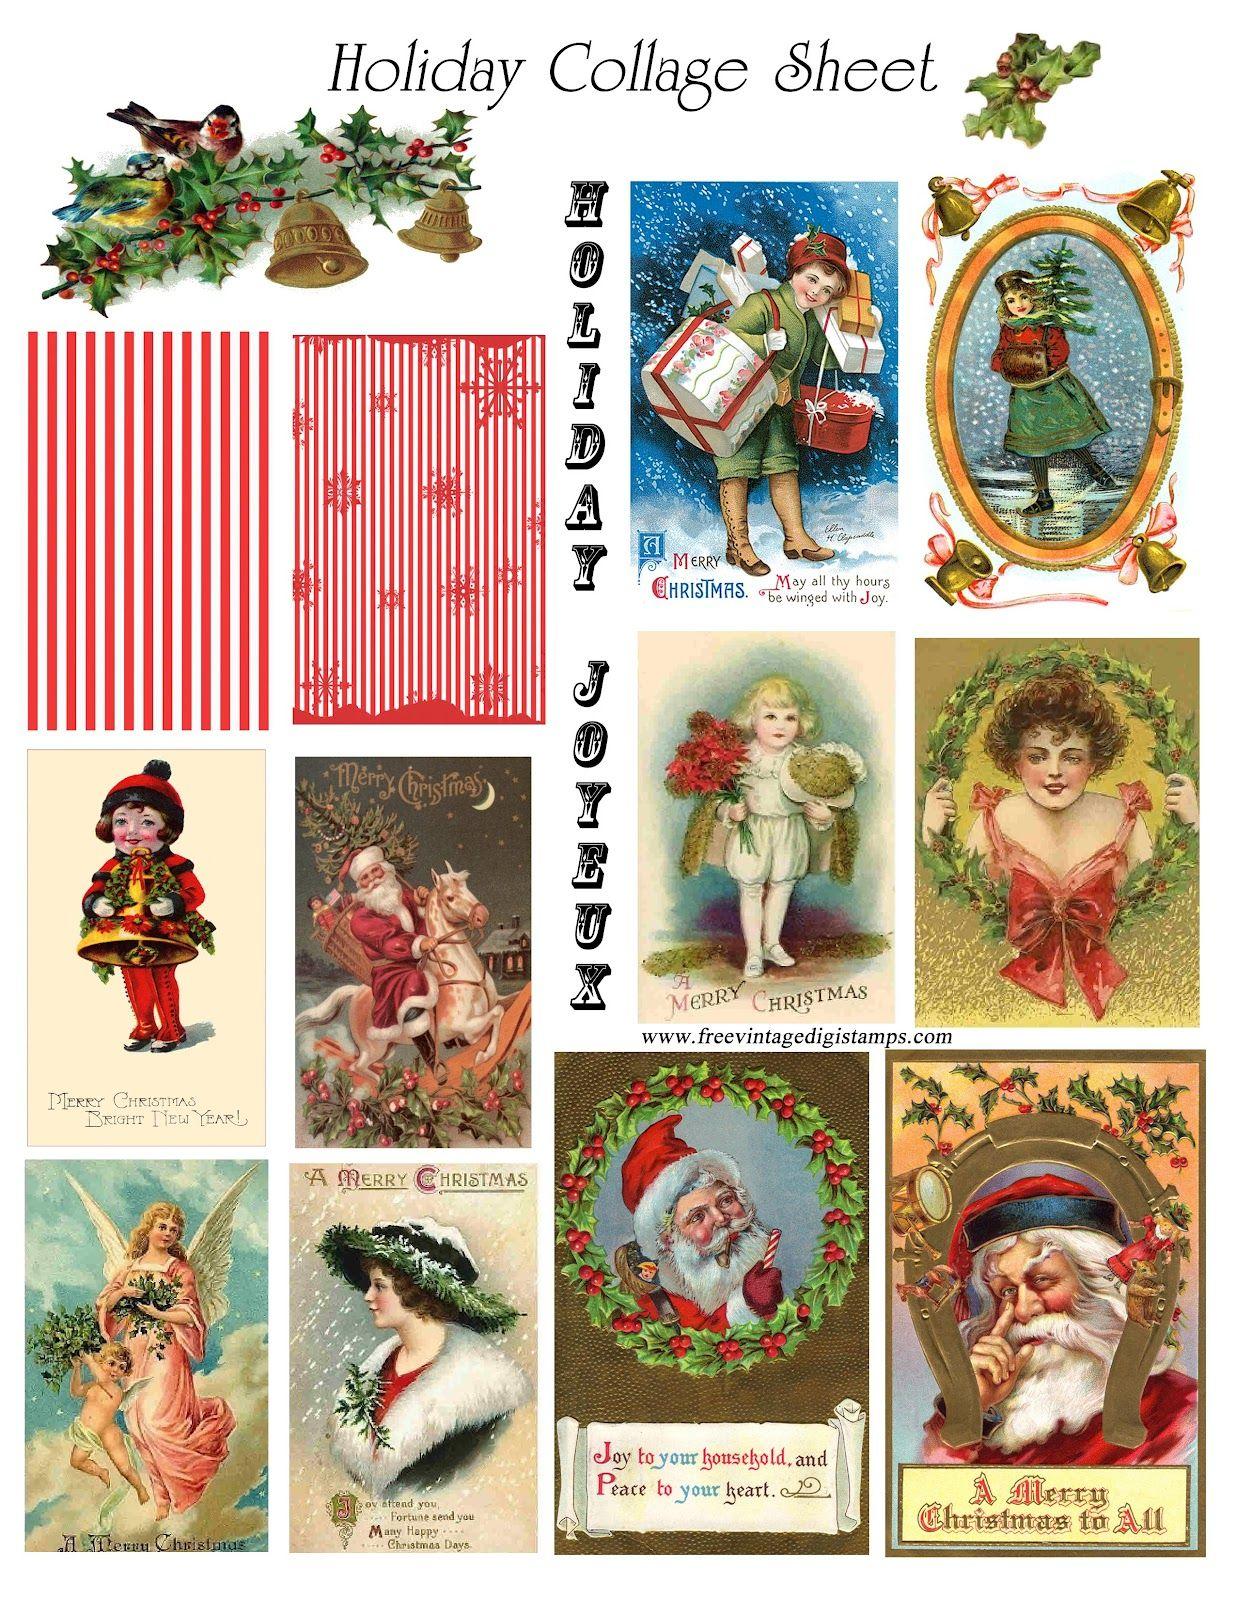 Vintage Cards Free Free Vintage Digital Stamps Free Vintage Printable Christmas Christmas Collage Vintage Christmas Vintage Christmas Images